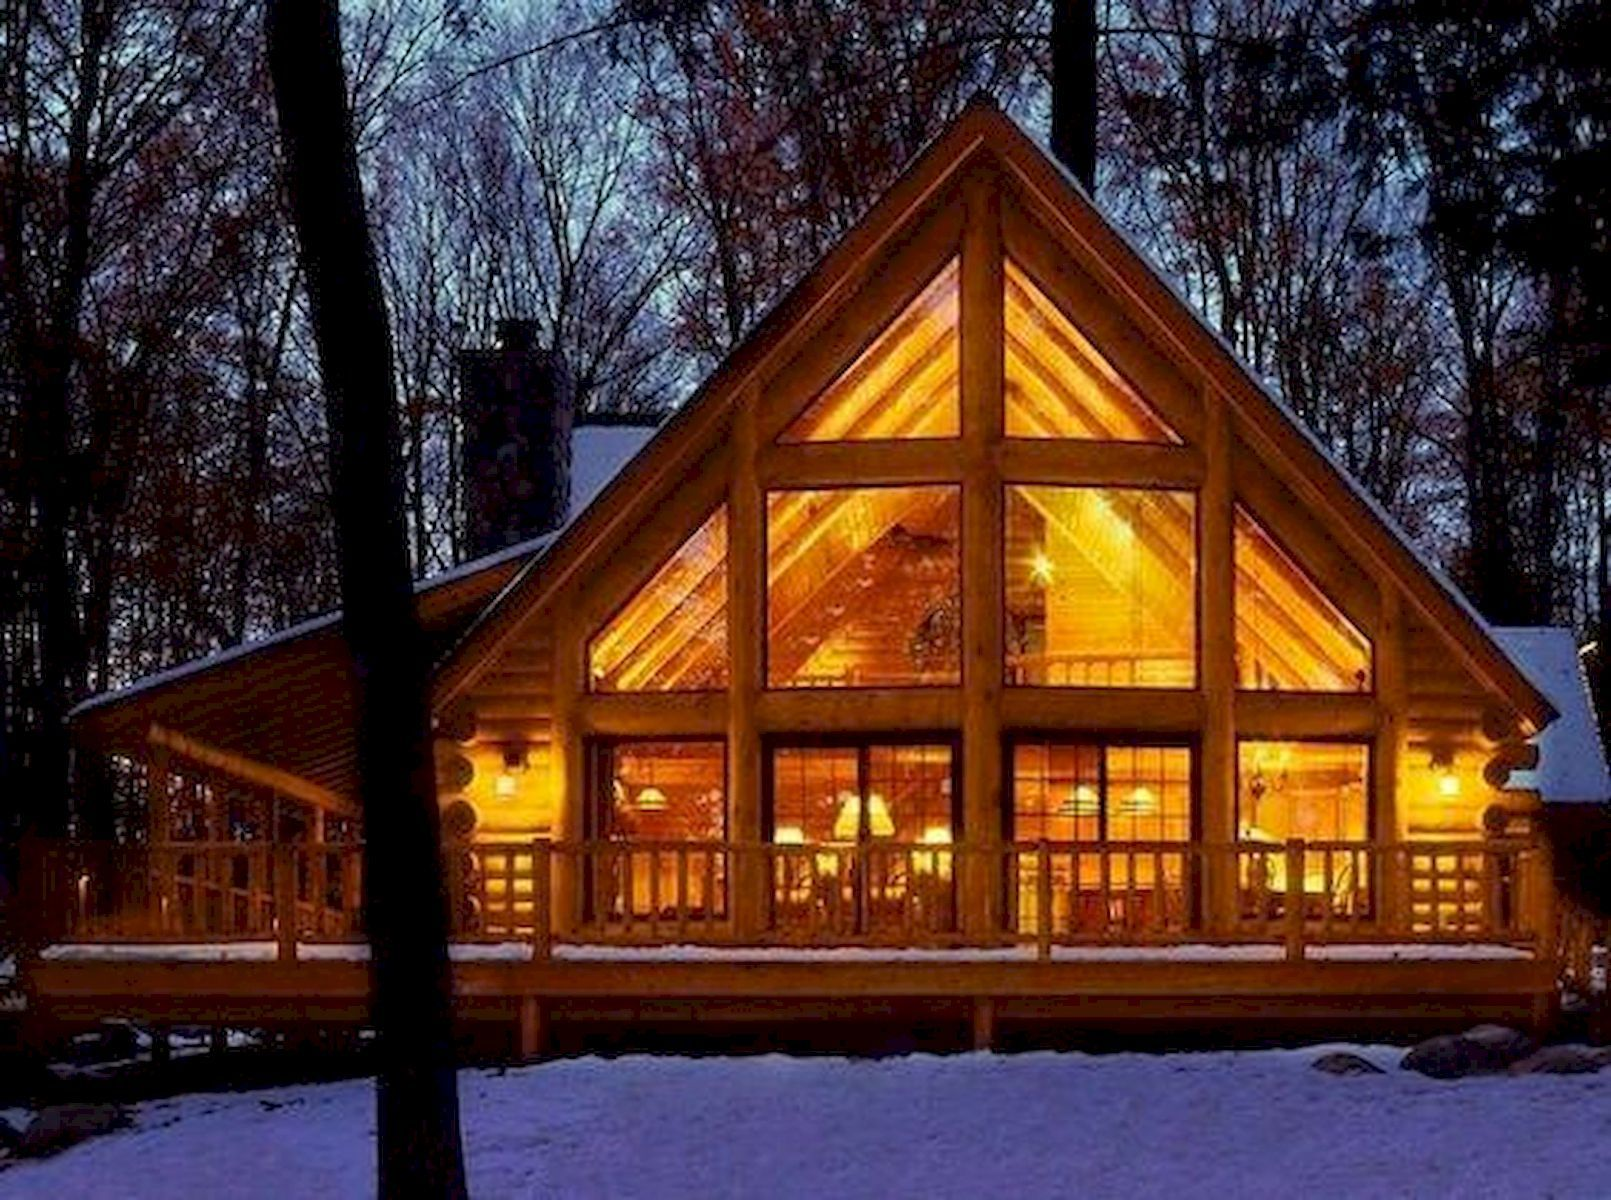 Nice 40 Stunning Log Cabin Homes Plans One Story Design Ideas Https Livingmarch Com 40 Stunning Log Cabin Homes Cabin Style Homes Log Cabin Homes Cabin Homes